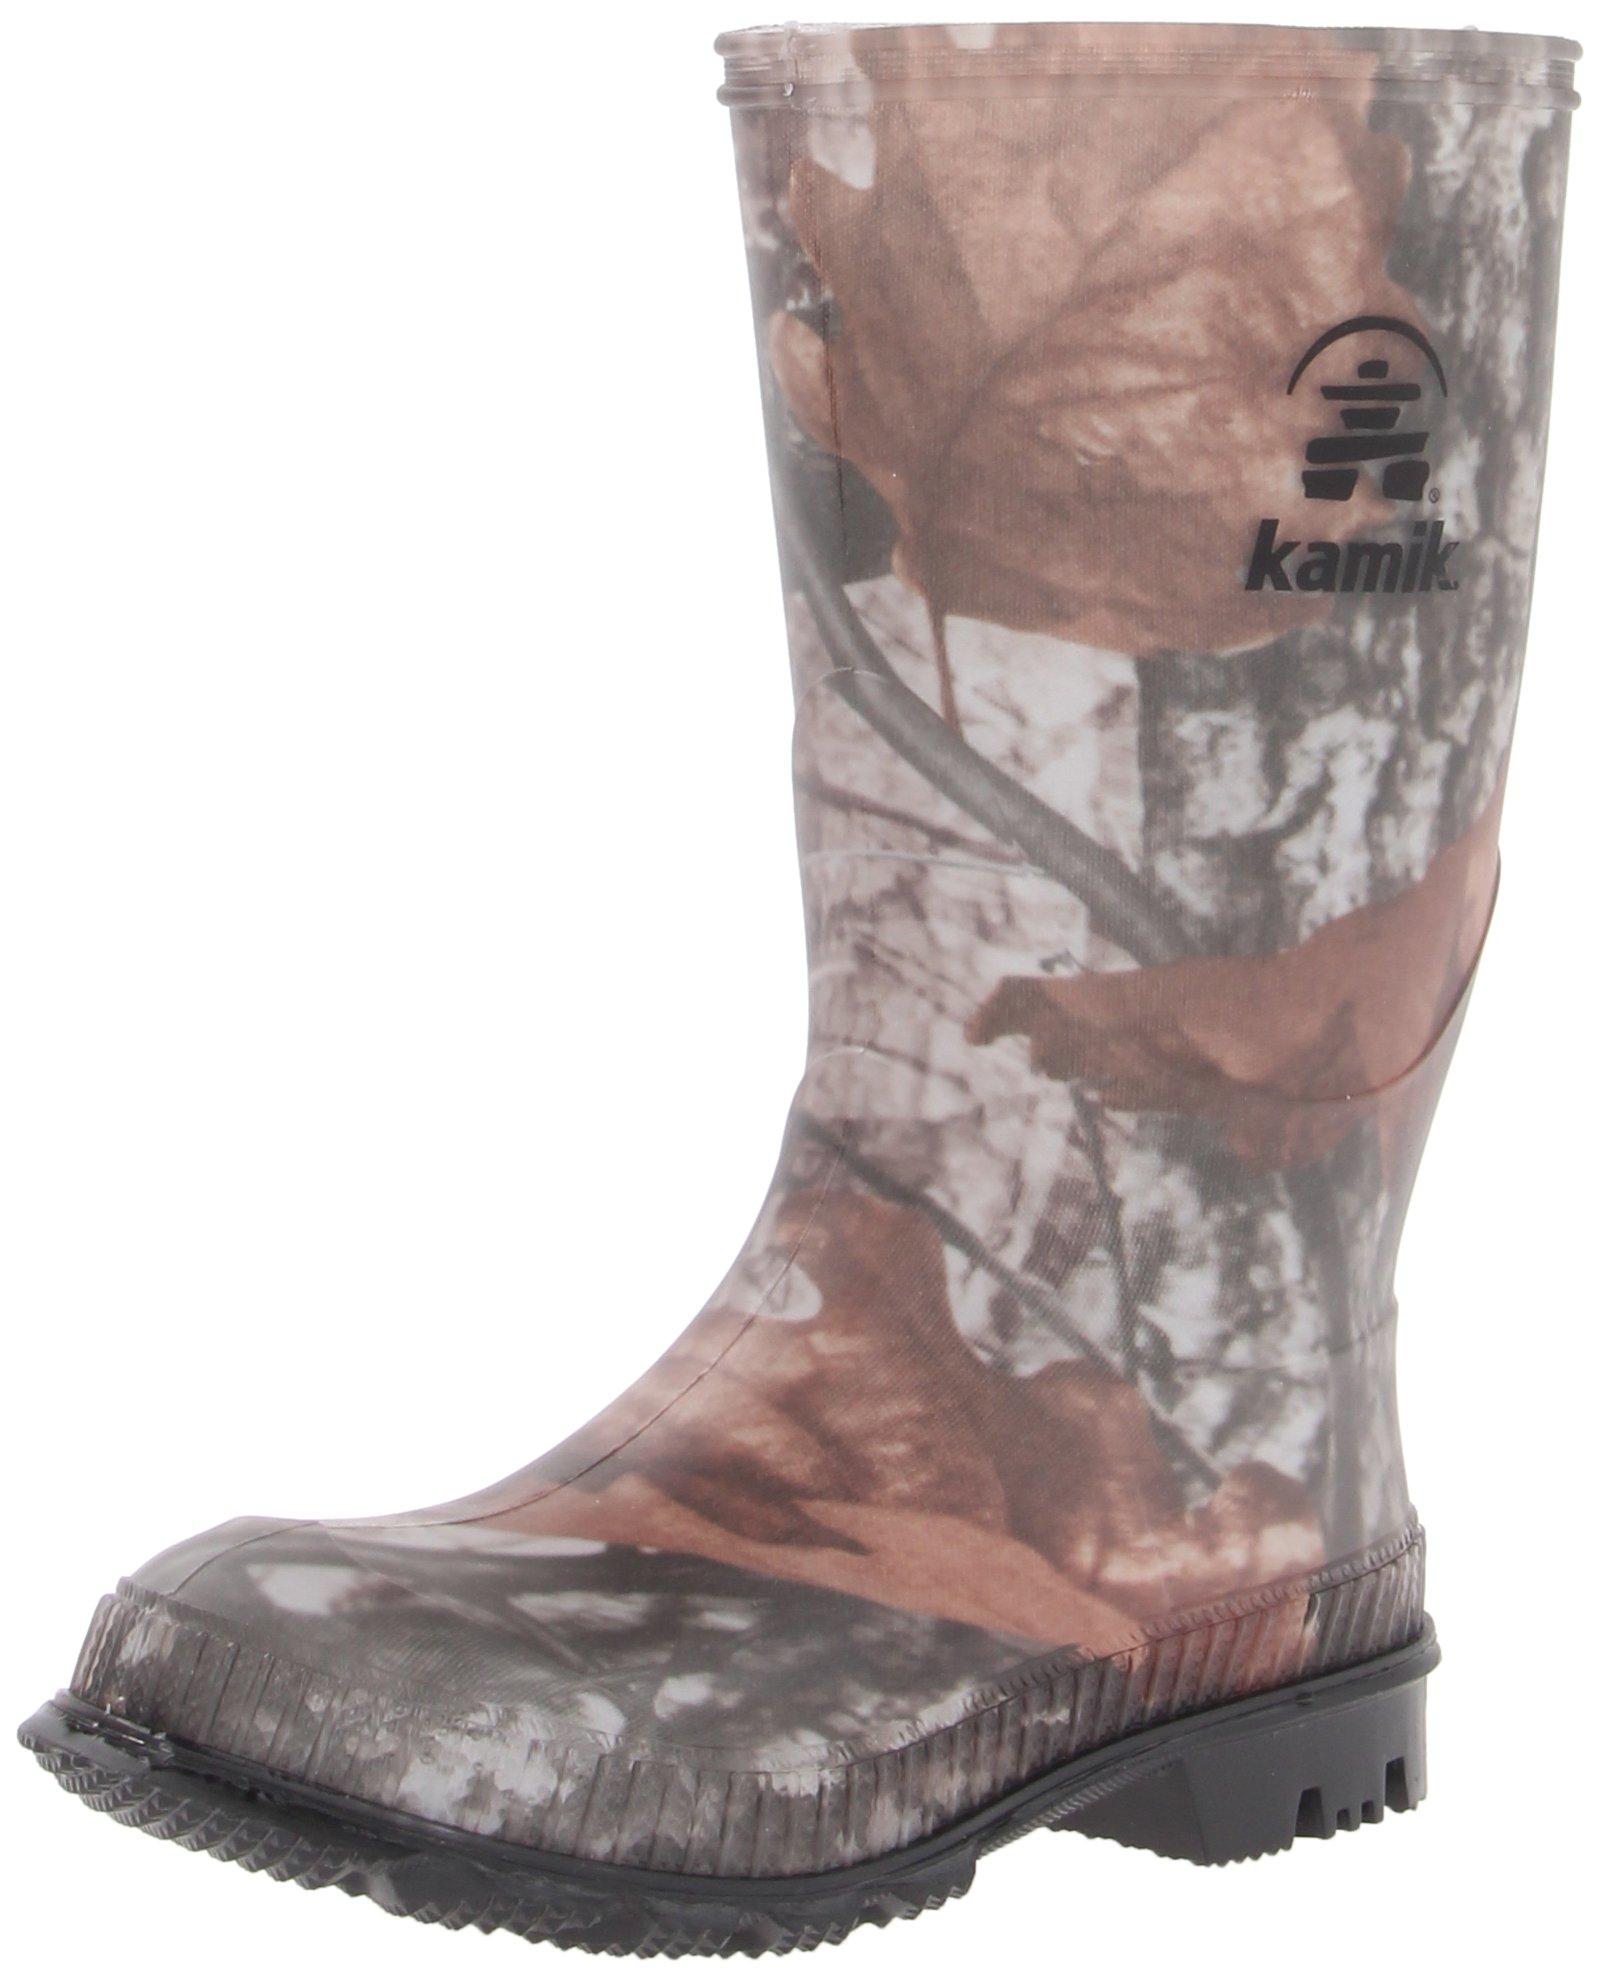 Kamik STOMP/KIDS/CAM/4176F Boot, Camo, 5 M US Big Kid